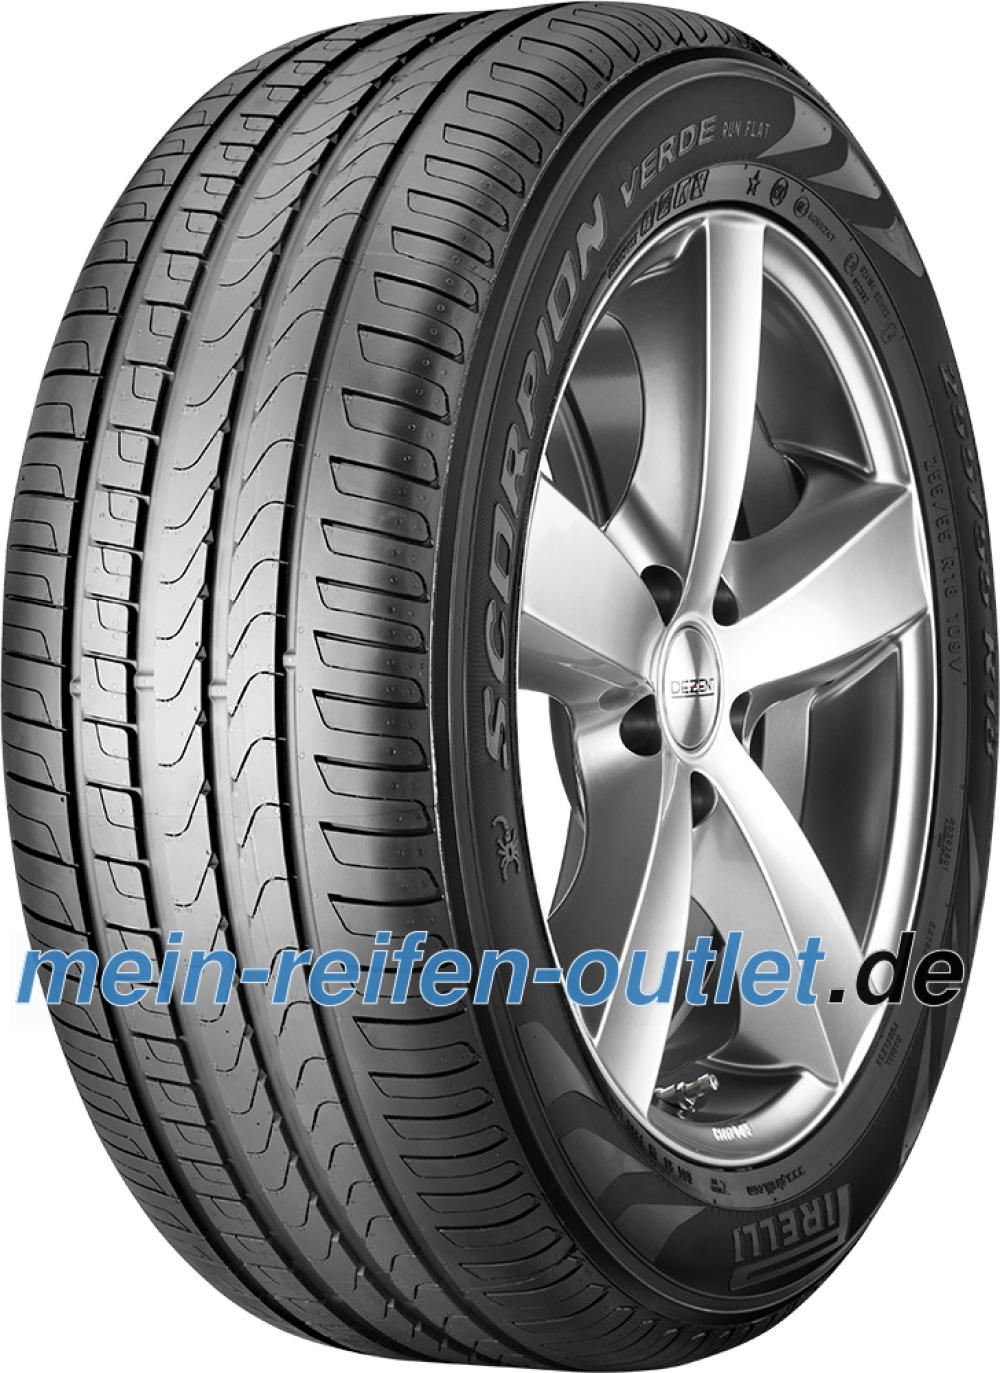 Pirelli Scorpion Verde runflat ( 255/55 R18 109V XL *, ECOIMPACT, mit Felgenschutz (MFS), runflat )